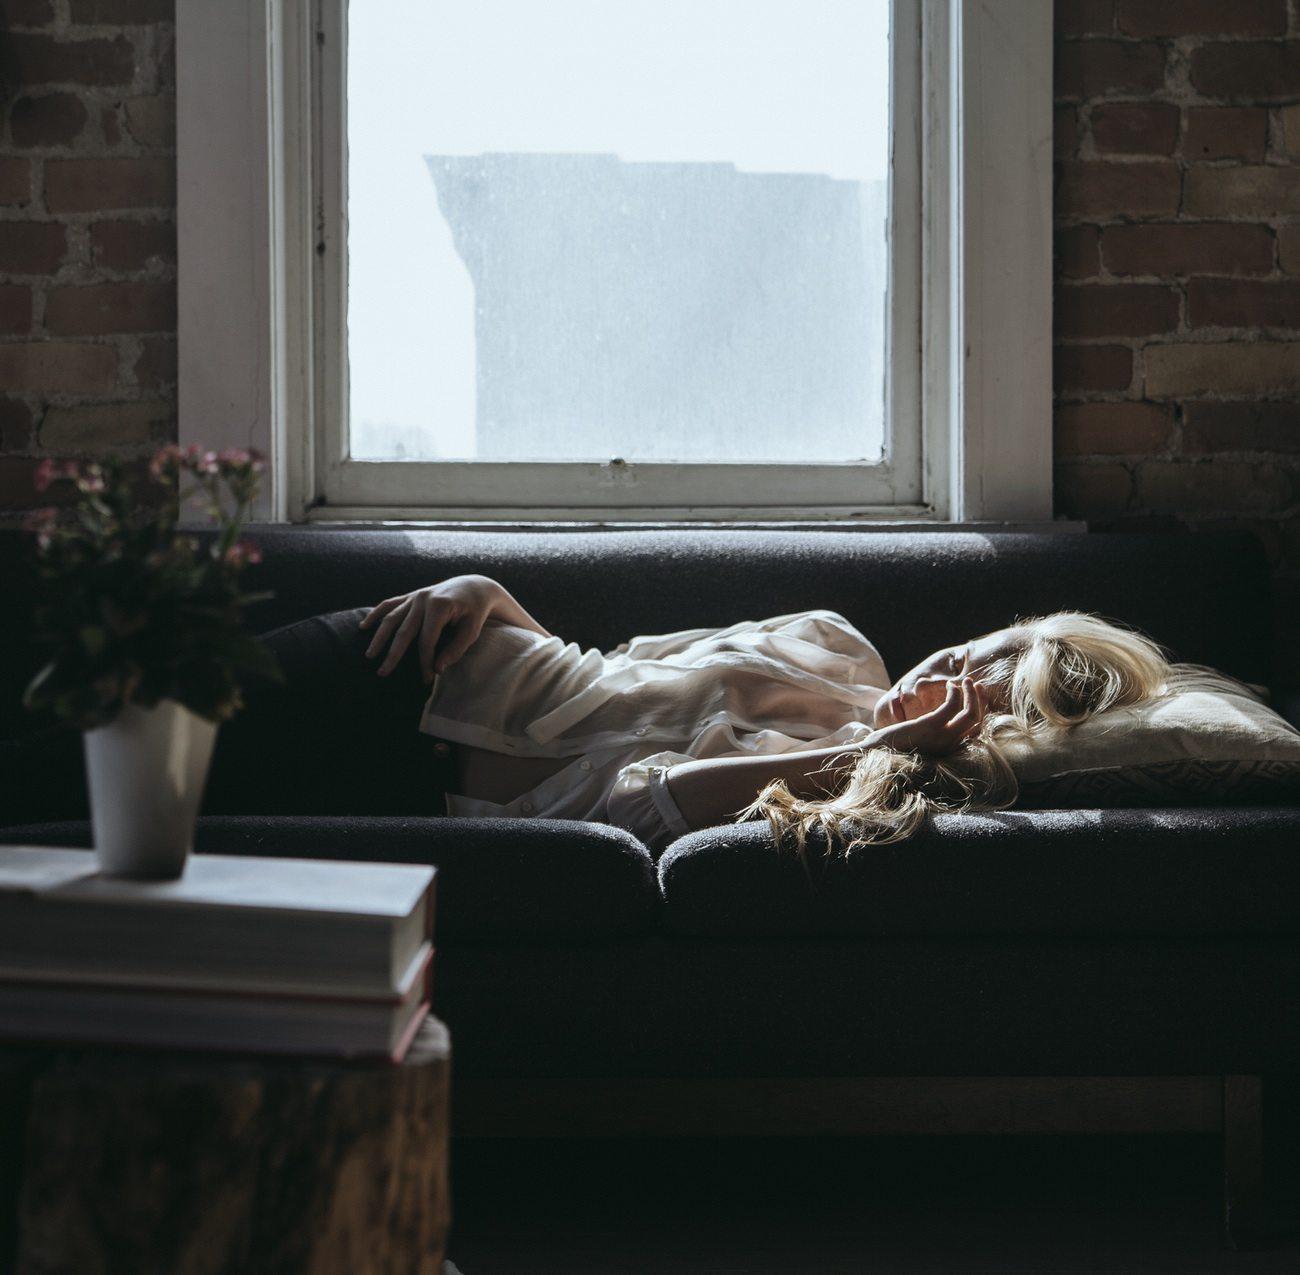 Sleep More and Save Money on Term Life Insurance